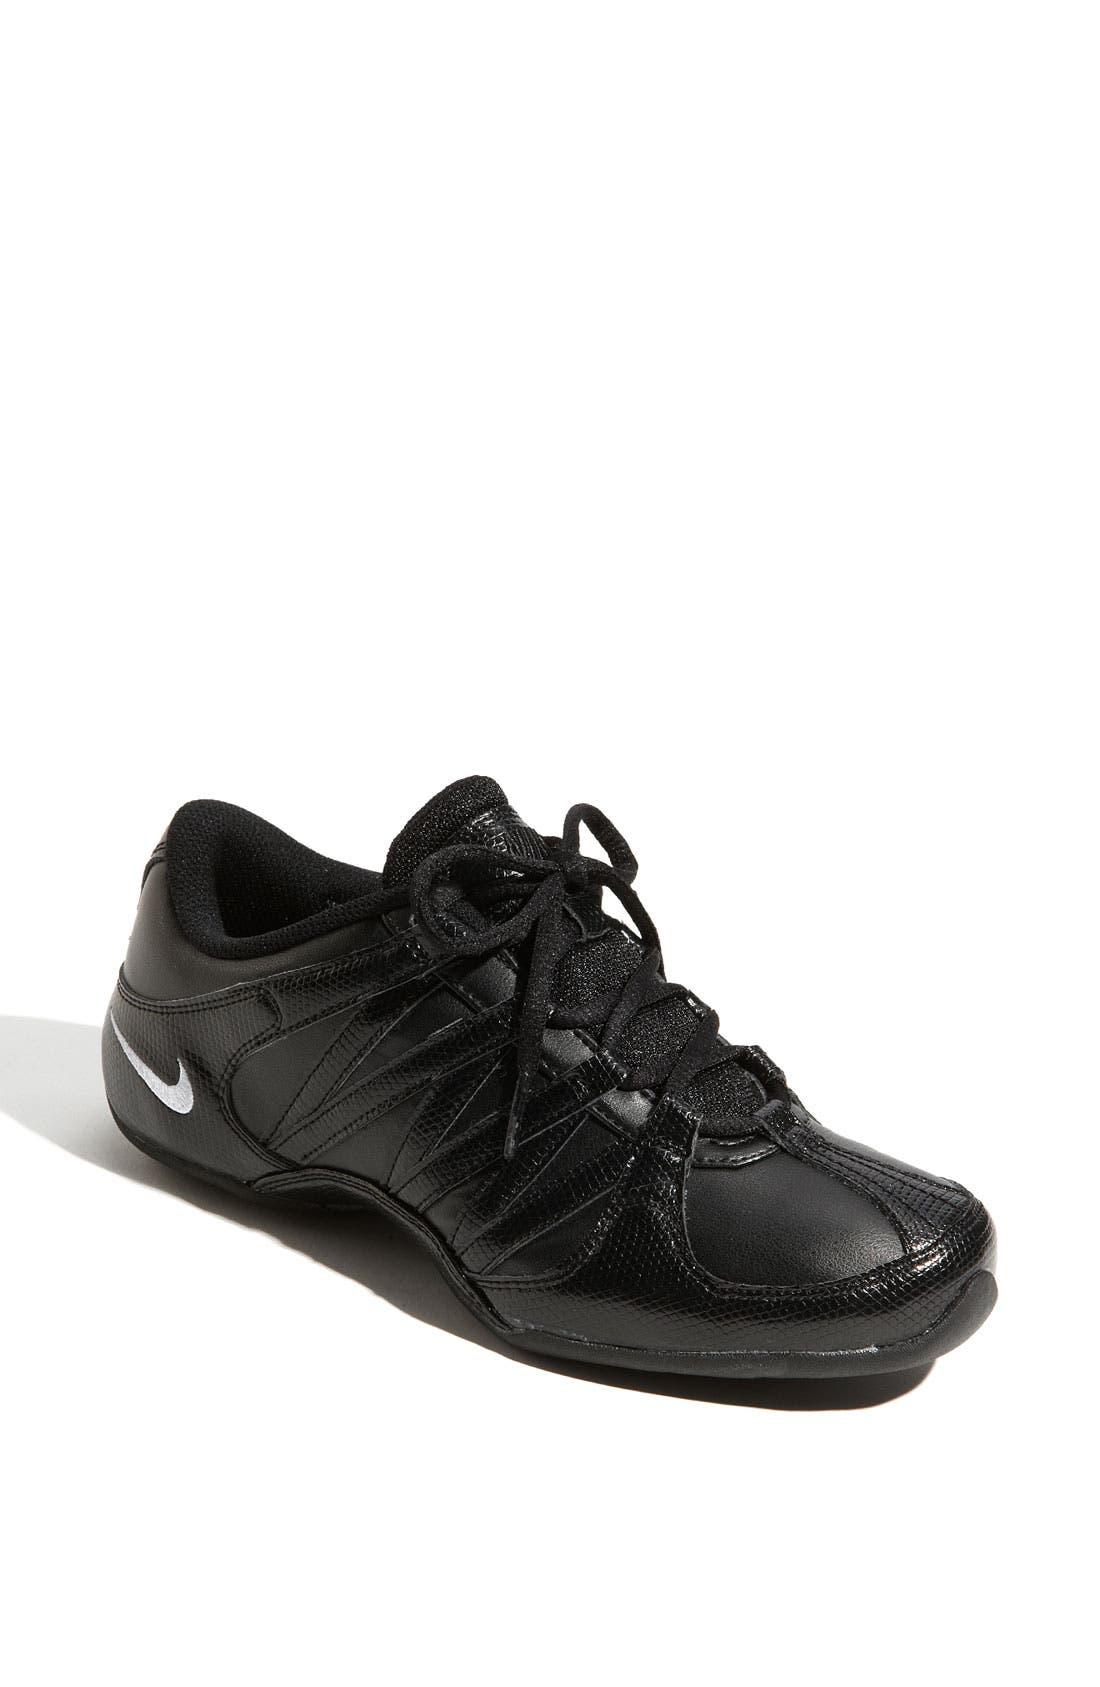 Alternate Image 1 Selected - Nike 'Musique IV' Dance Shoe